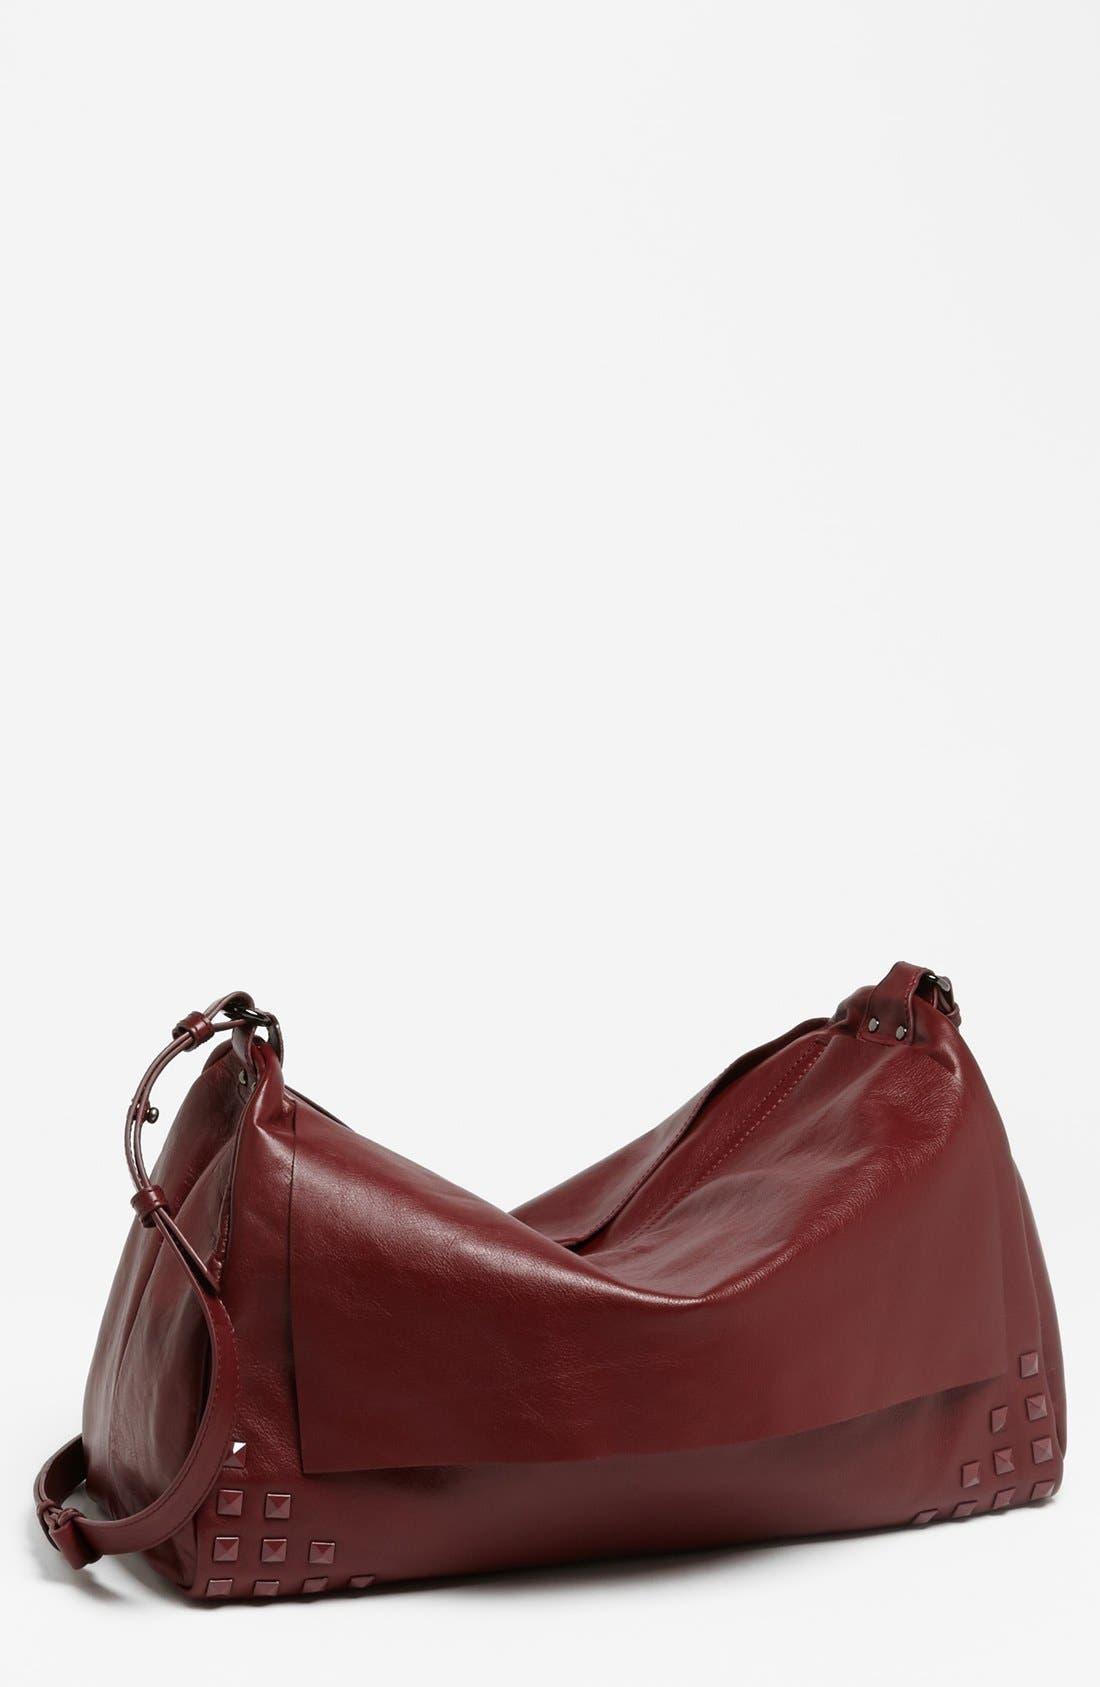 Alternate Image 1 Selected - Trouvé 'Large' Studded Leather Crossbody Bag